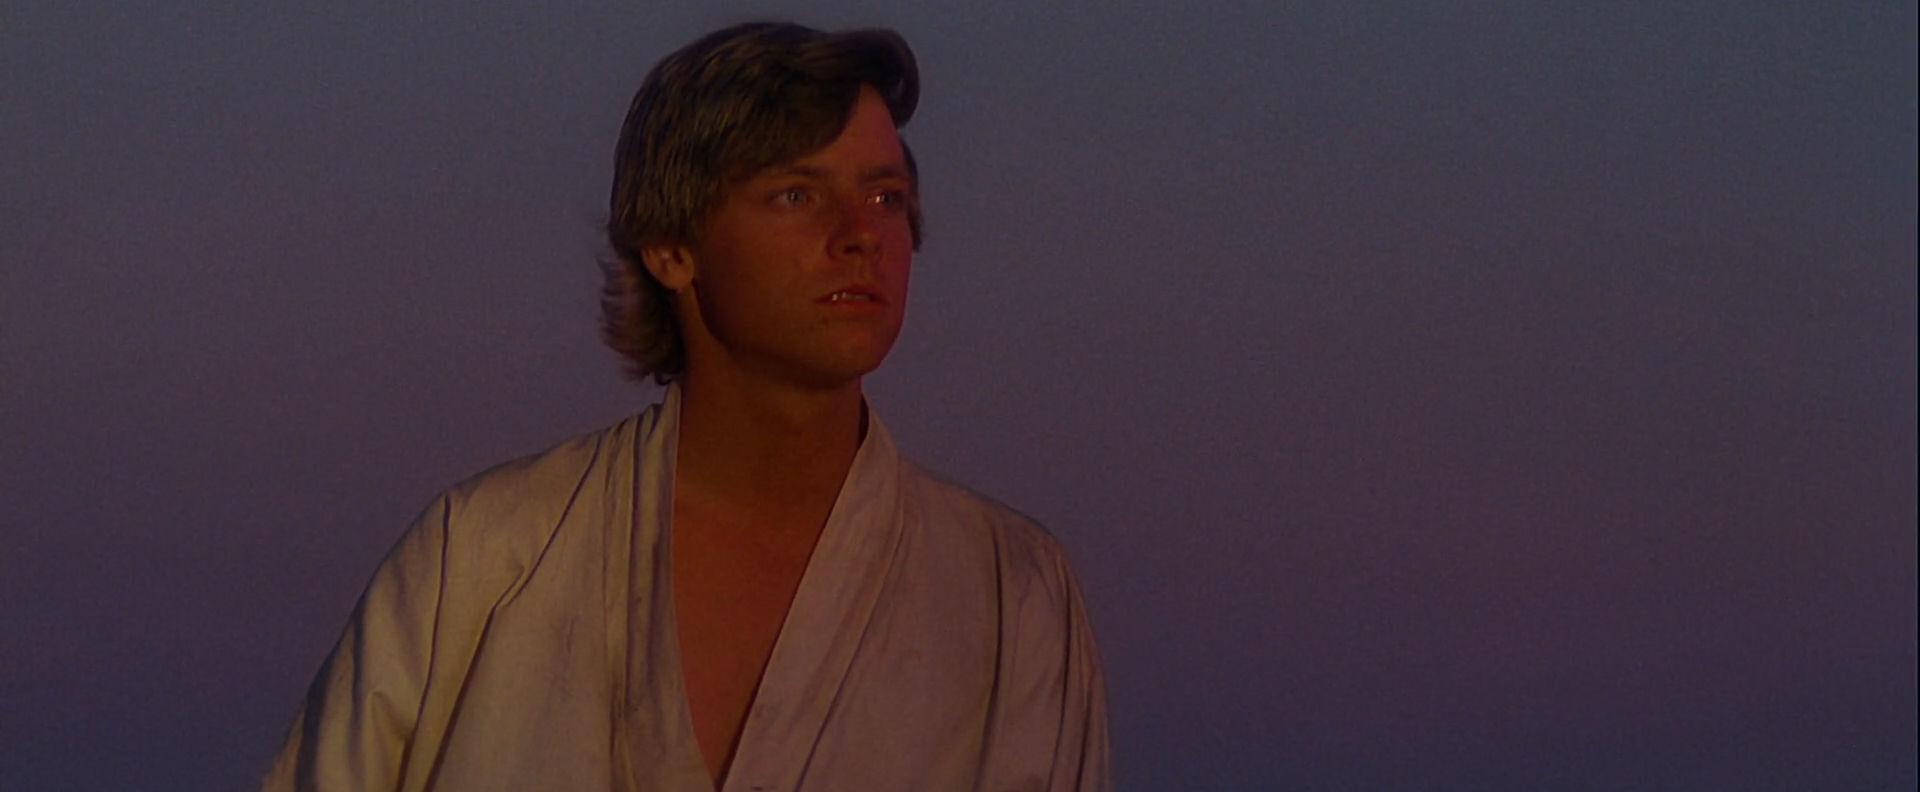 Luke Watching the Sunset